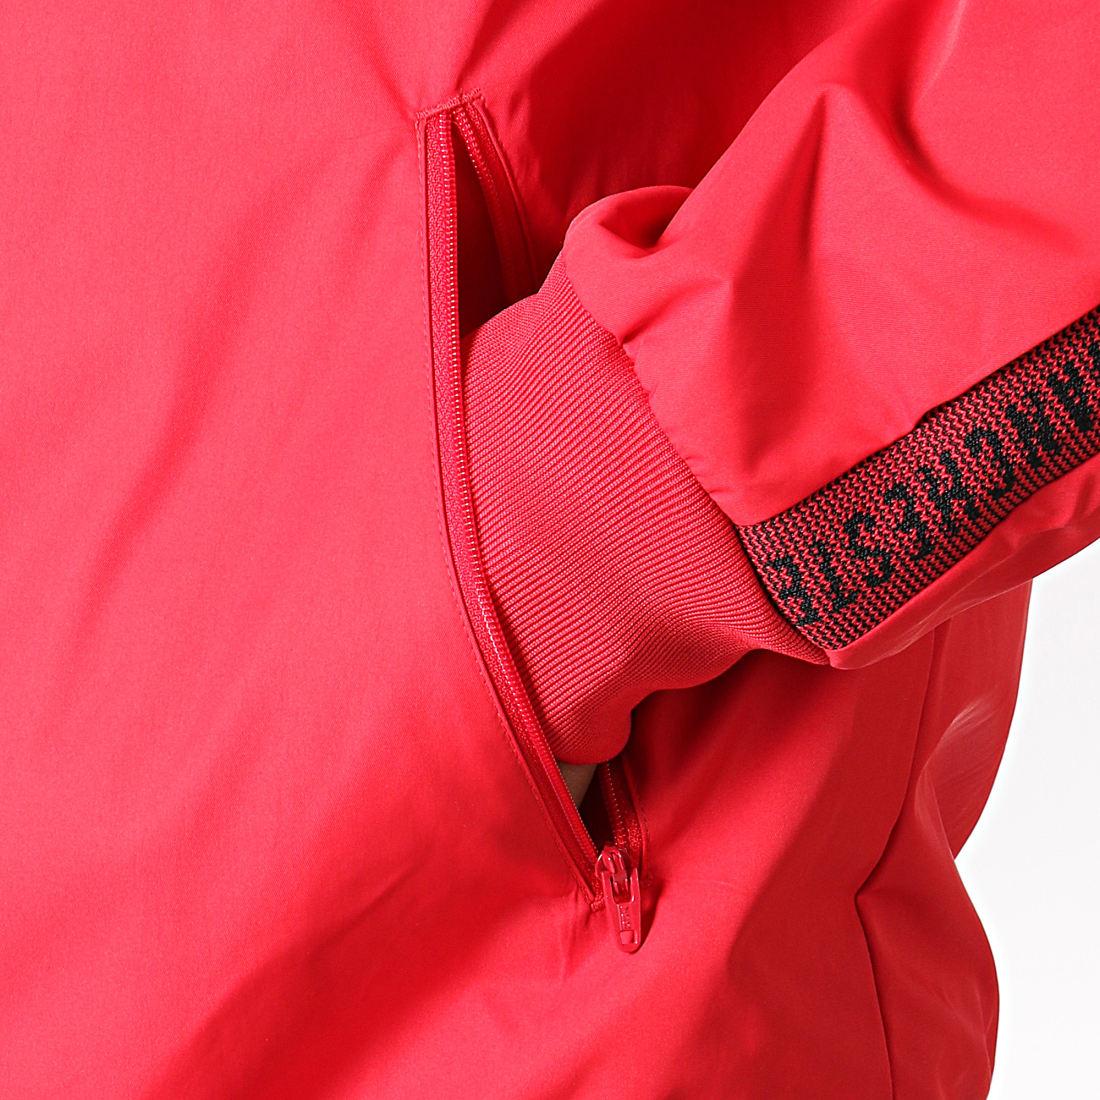 Veste rouge adidas rouge satin